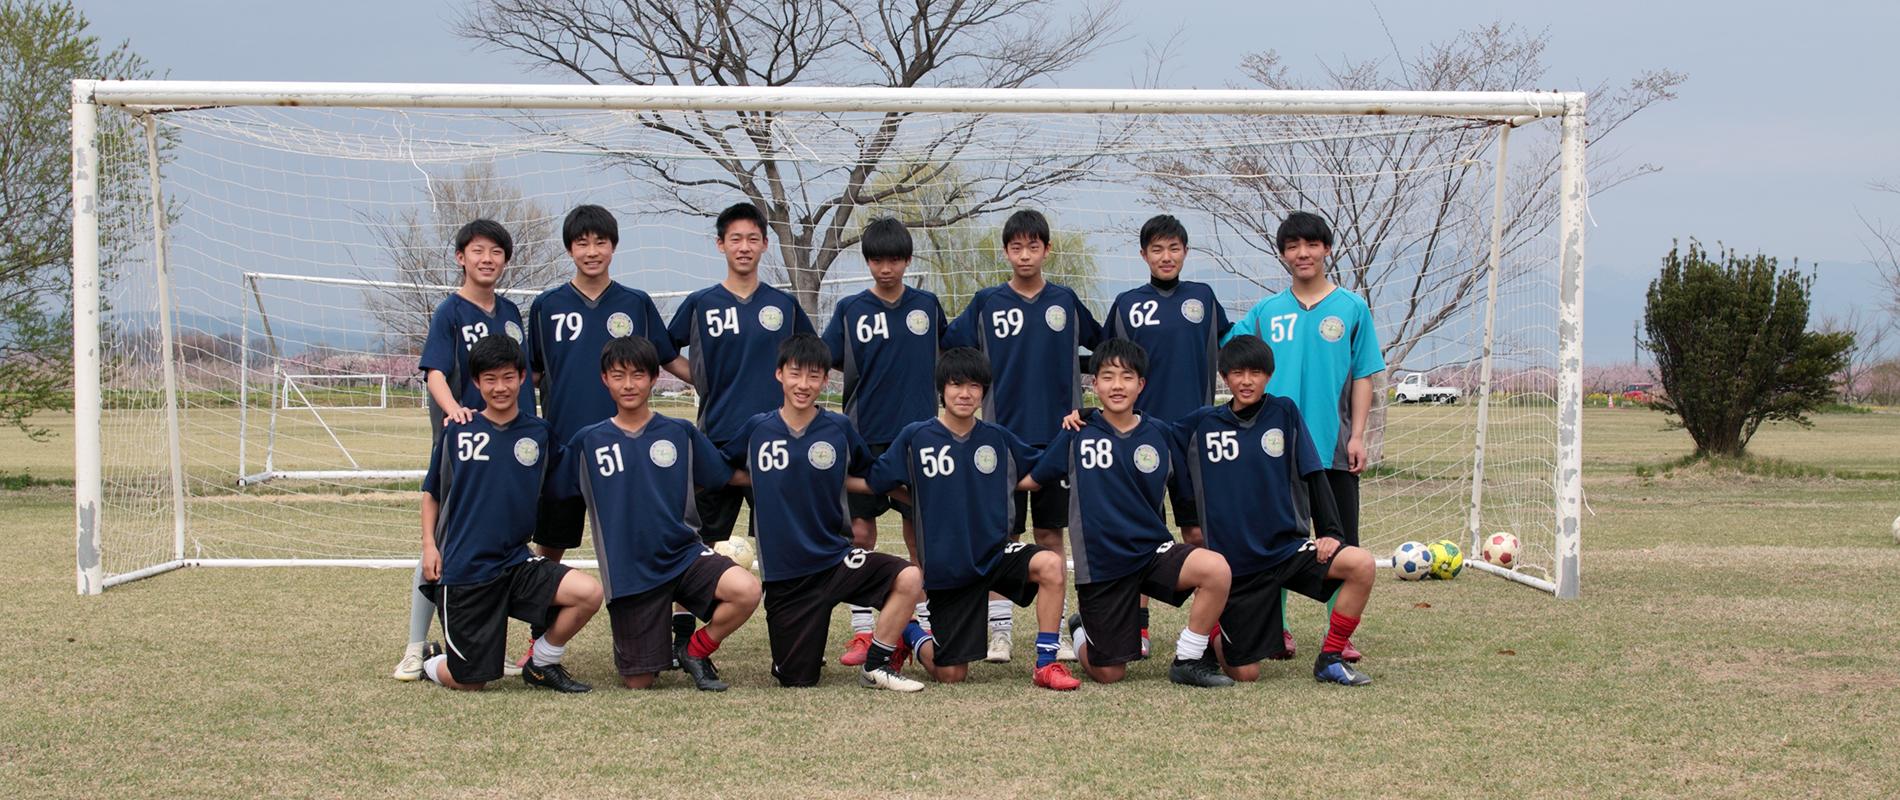 2019 U-15